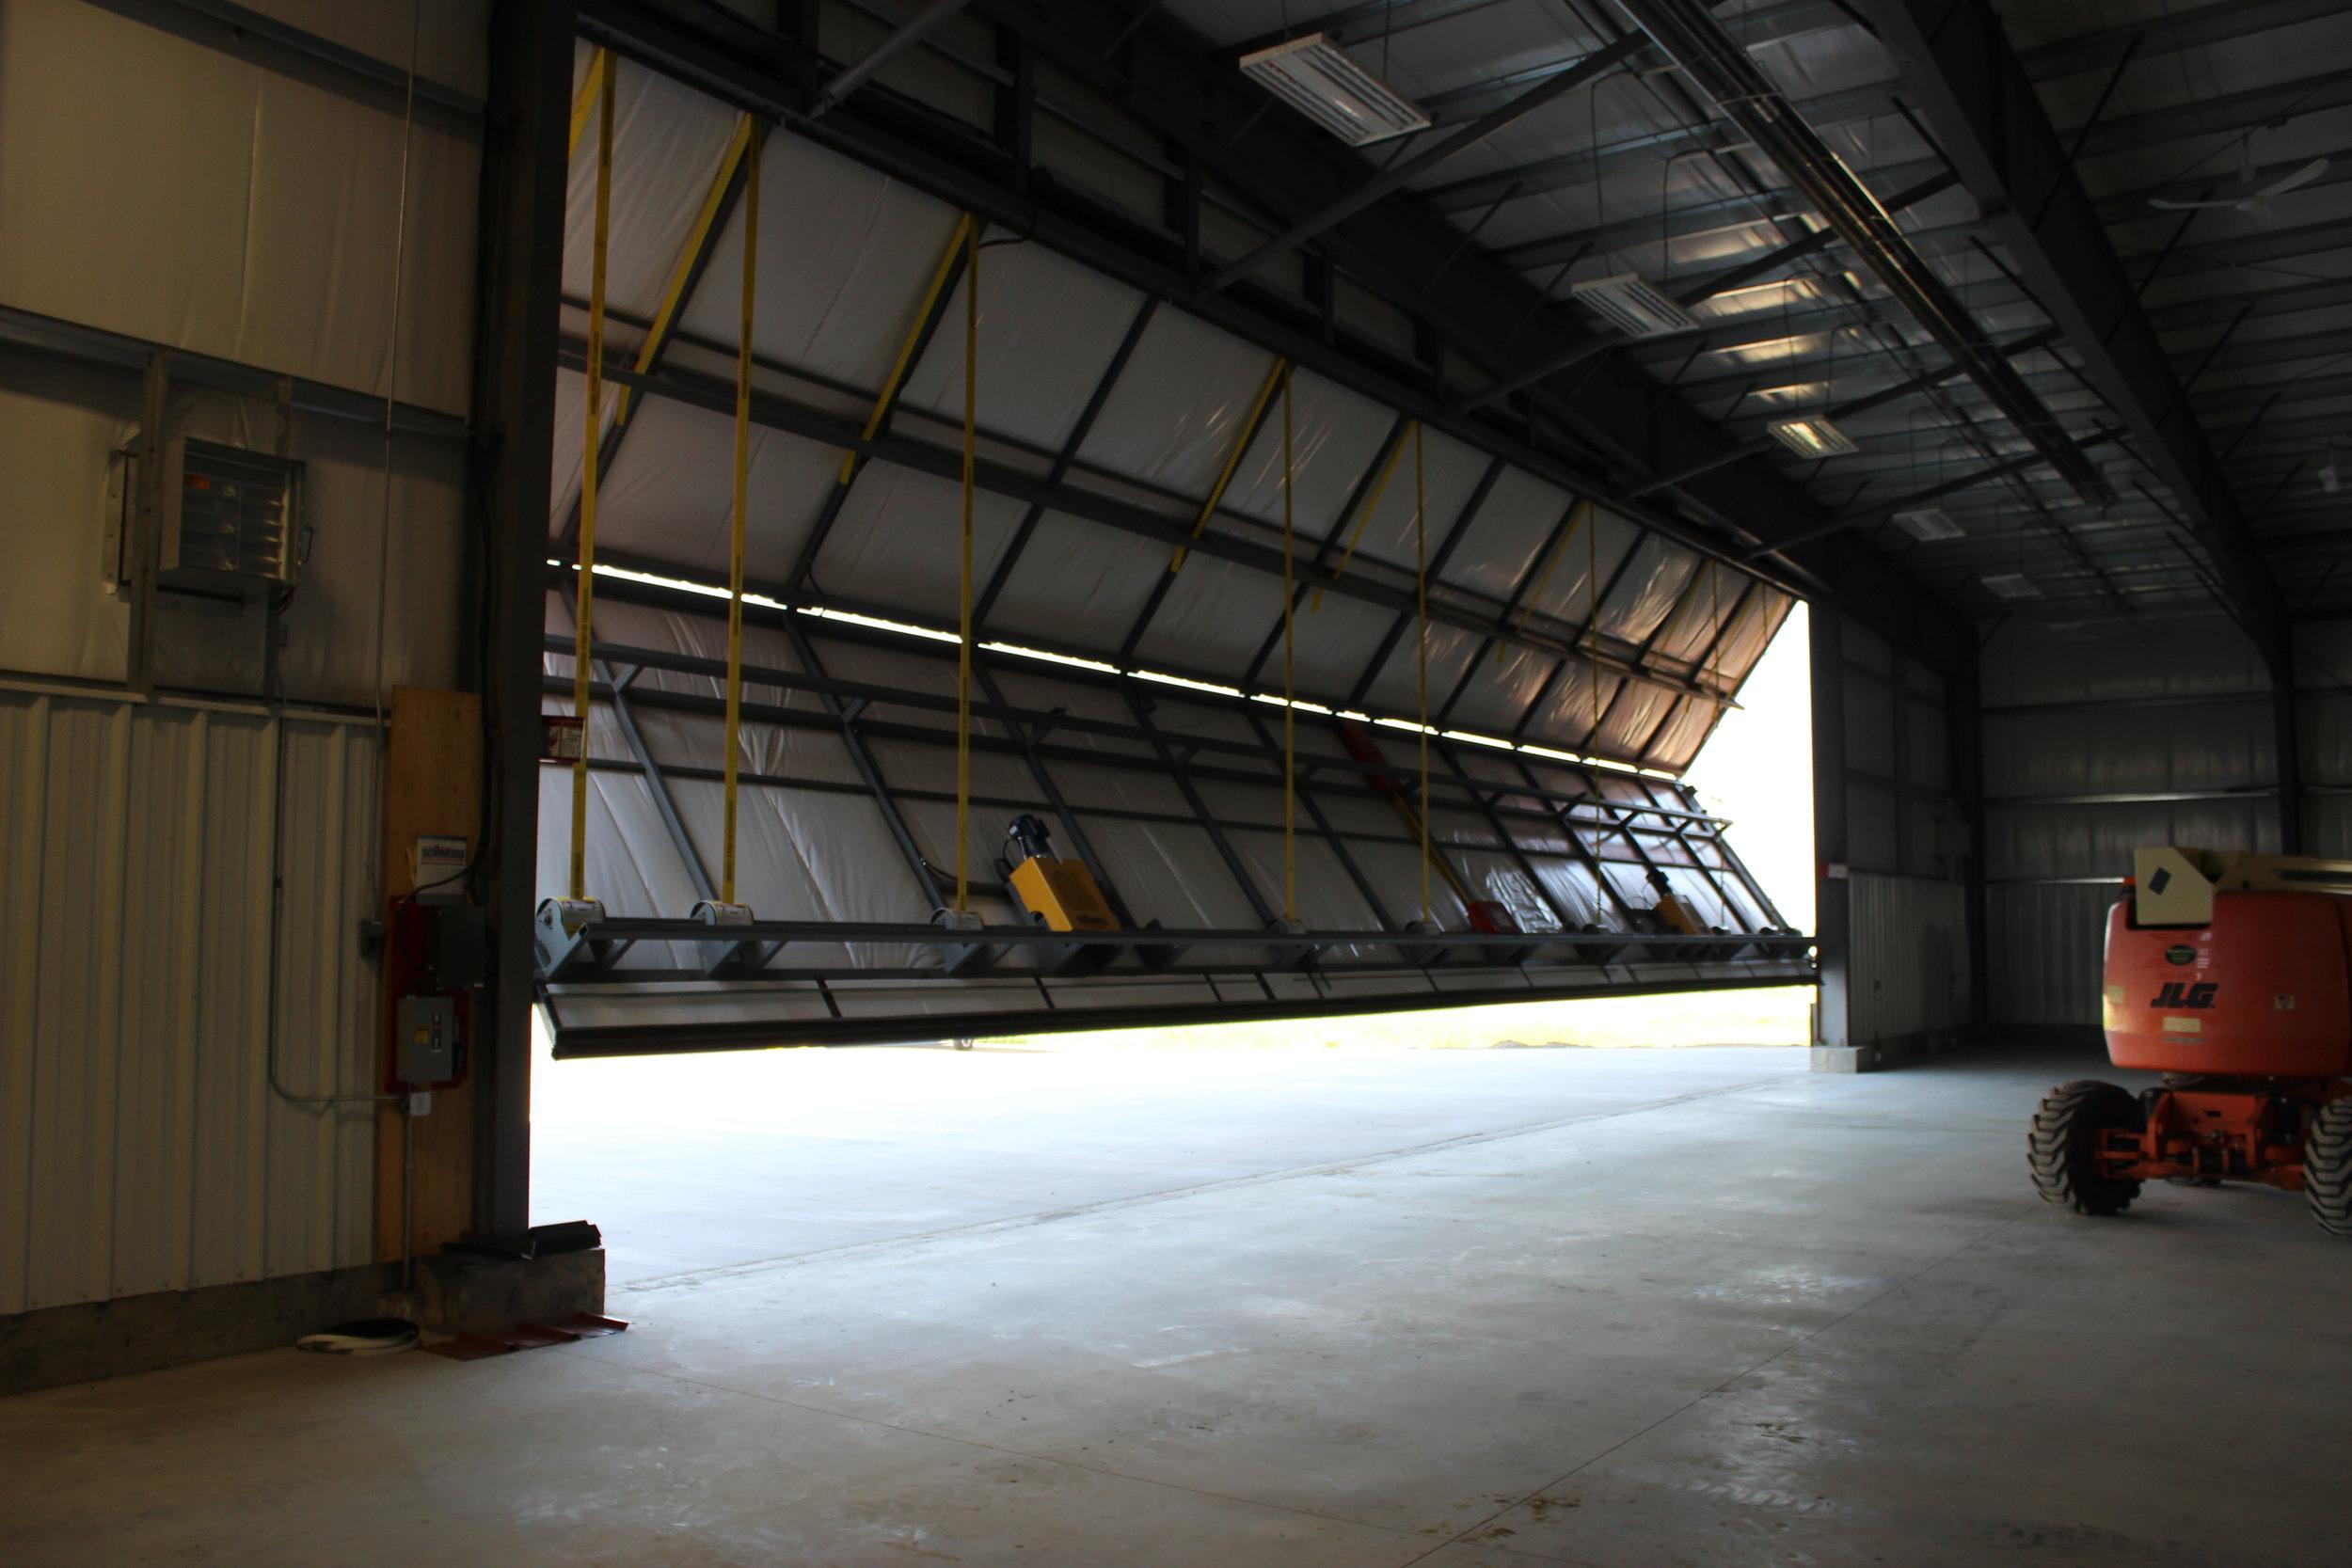 Sarasota Hanger  Located at Villeneuve AB.  An Aricraft Hanger.